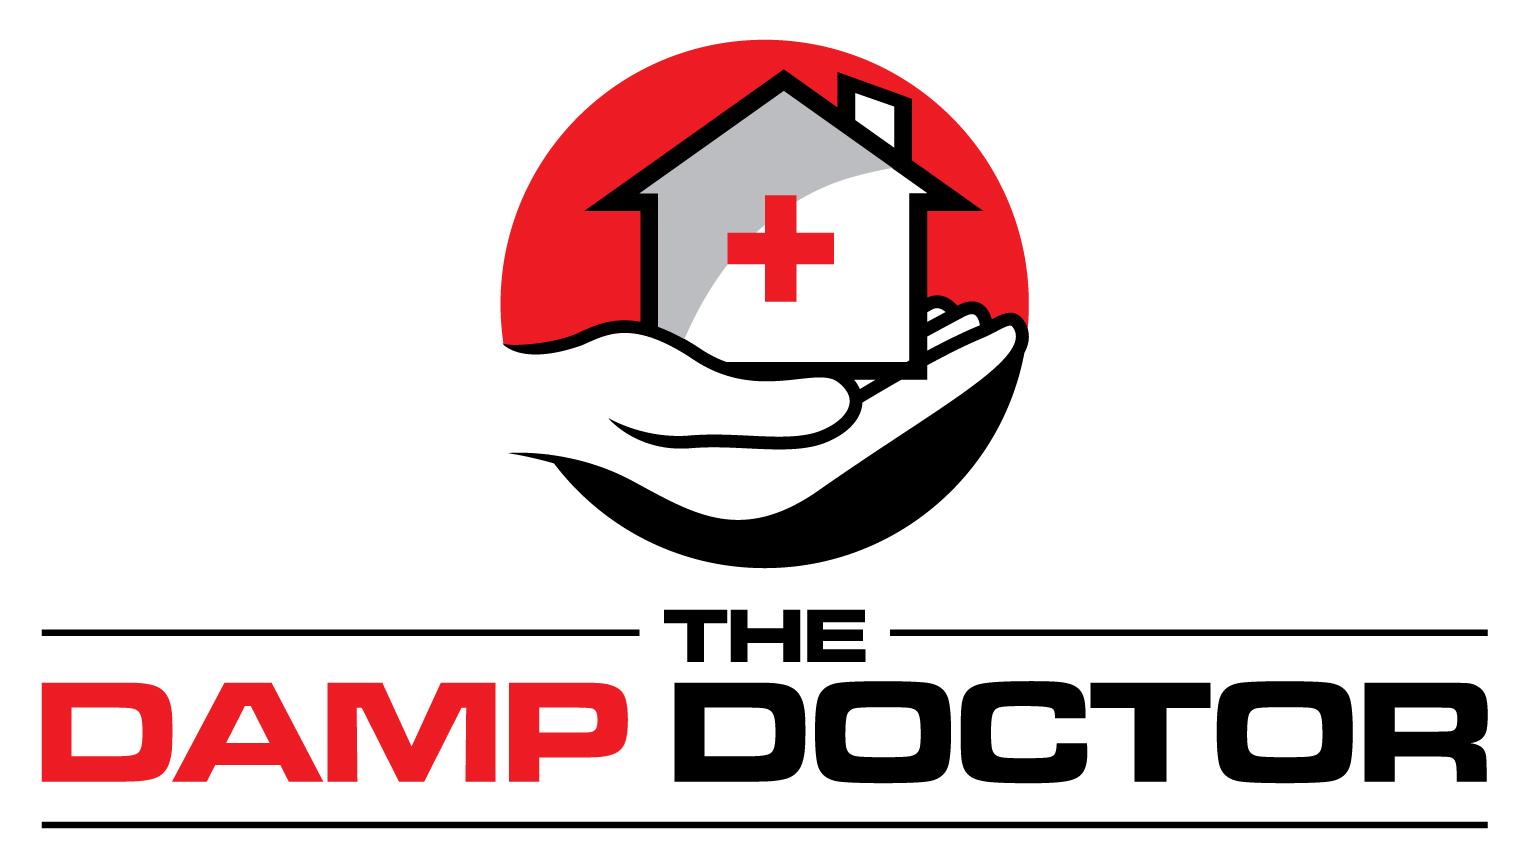 The Damp Doctor Ltd